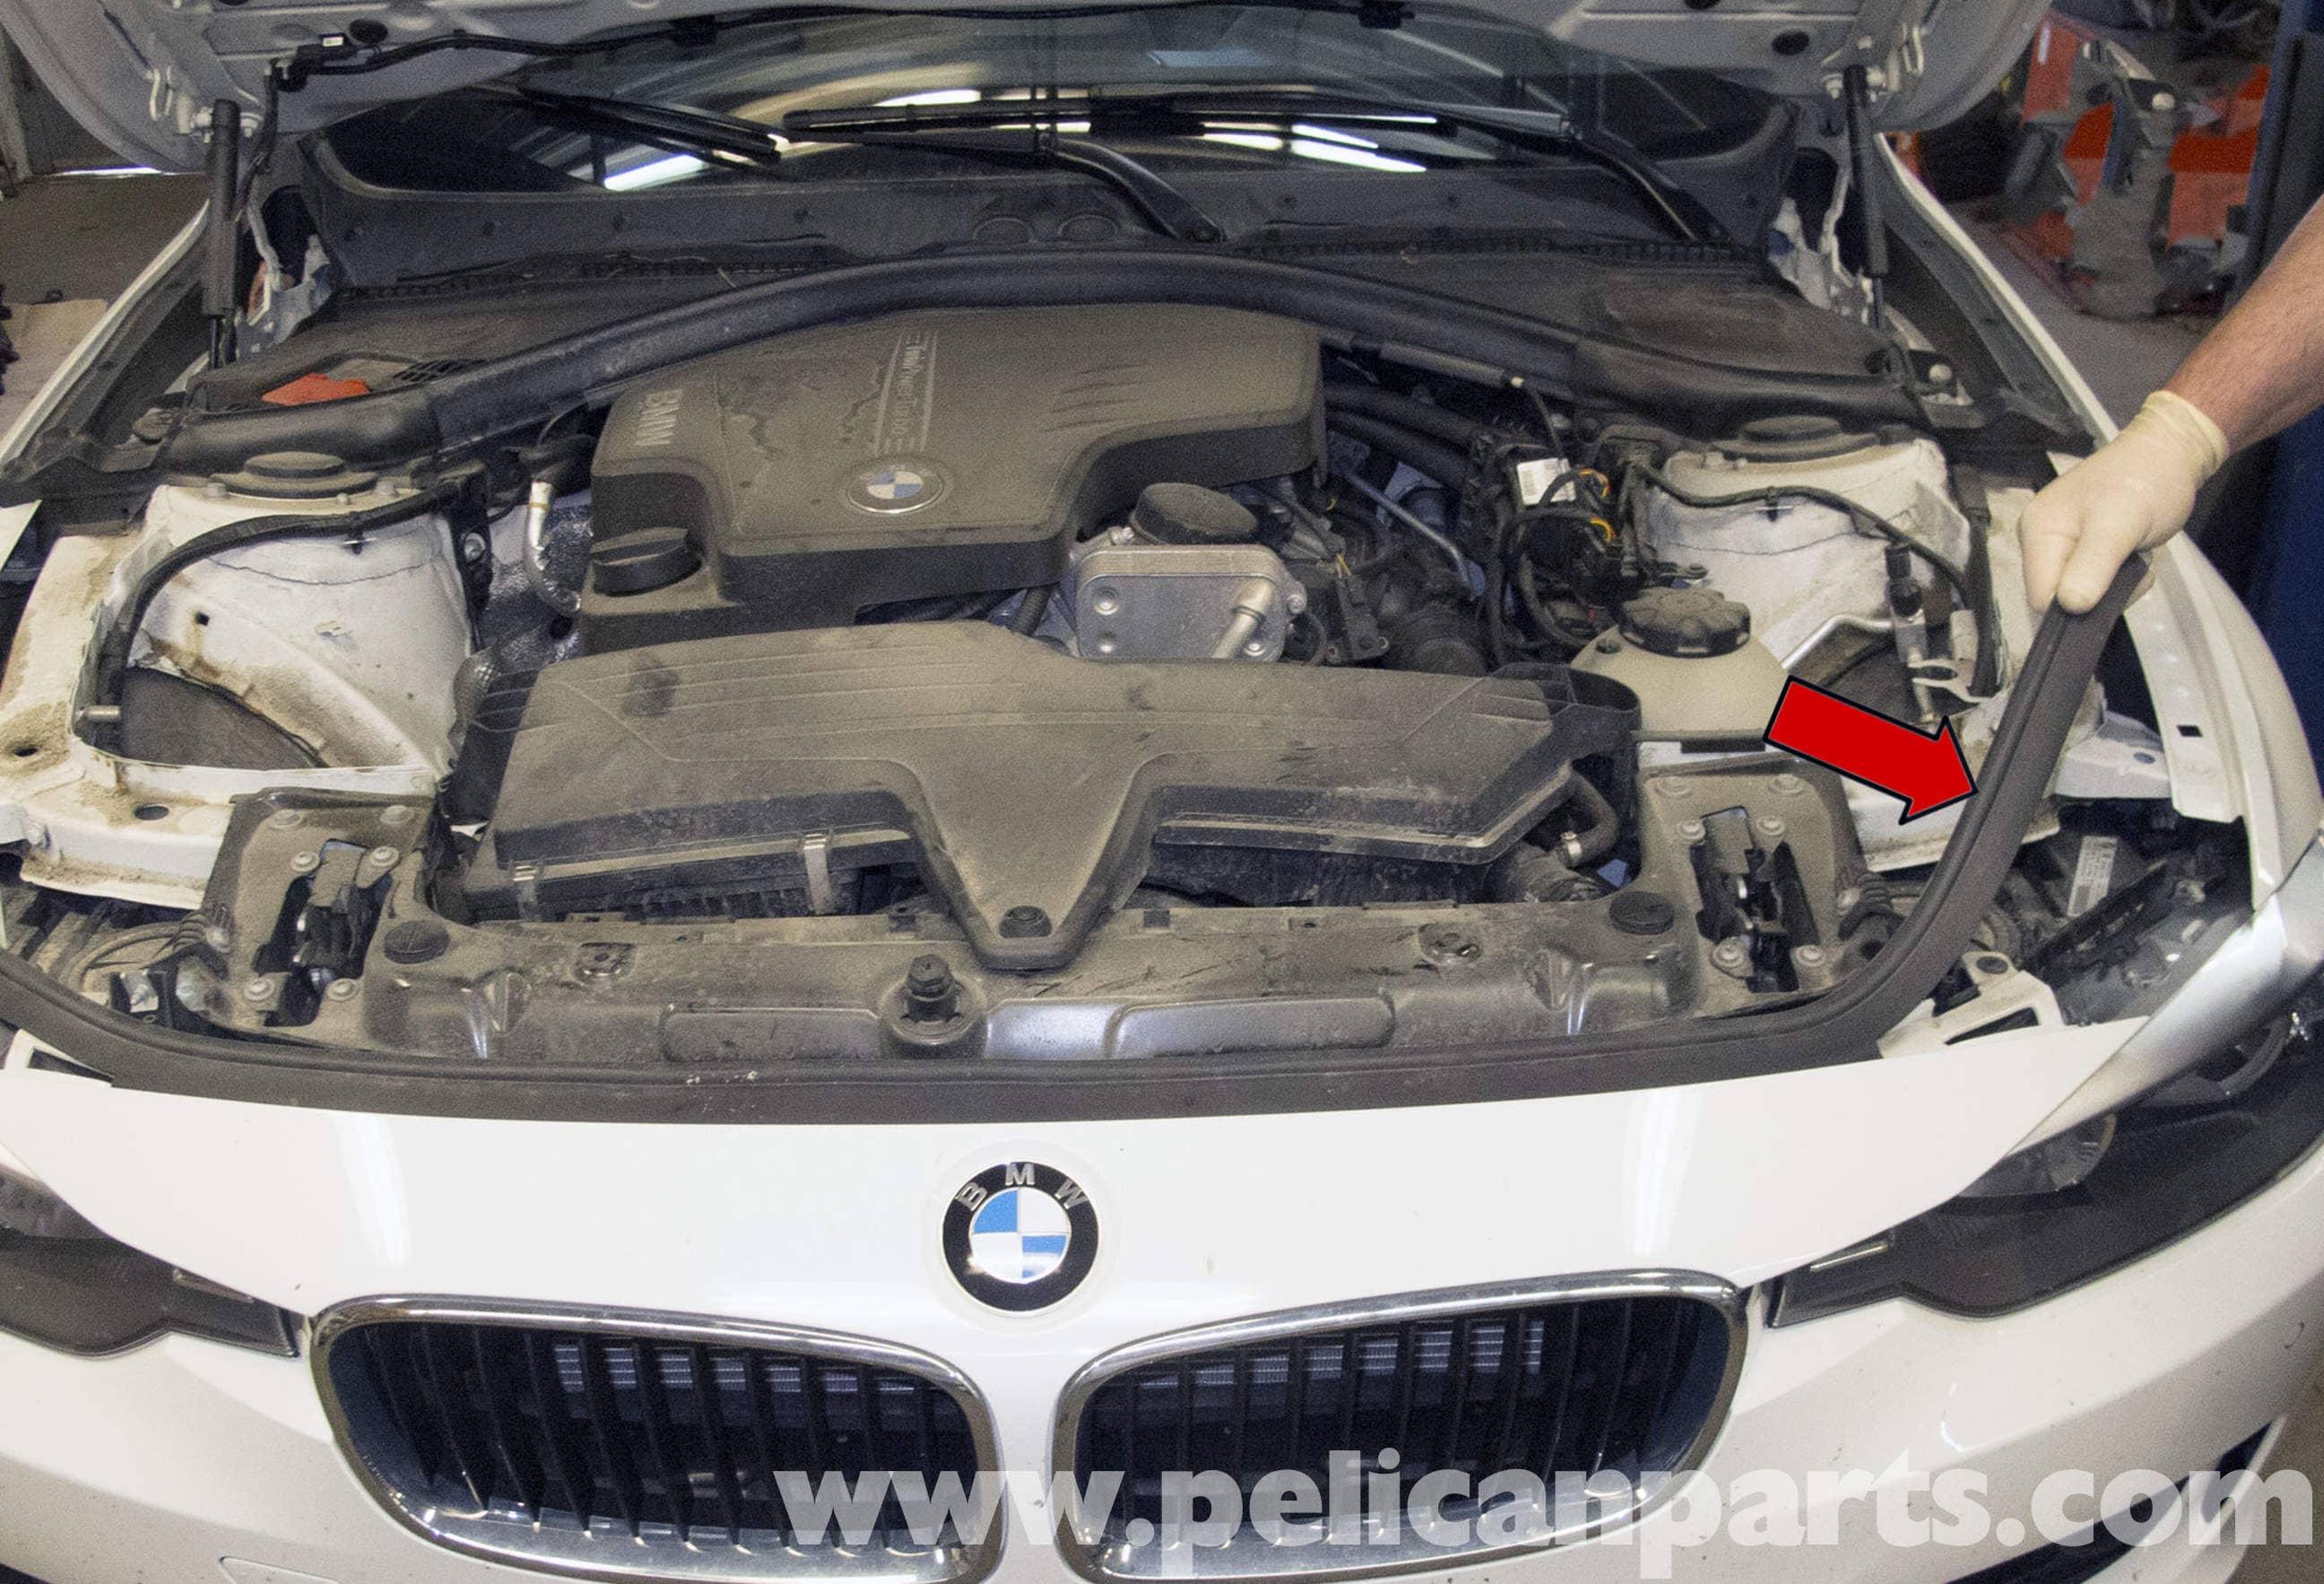 Pelican Parts Technical Article - BMW F30 3-Series - Front Bumper